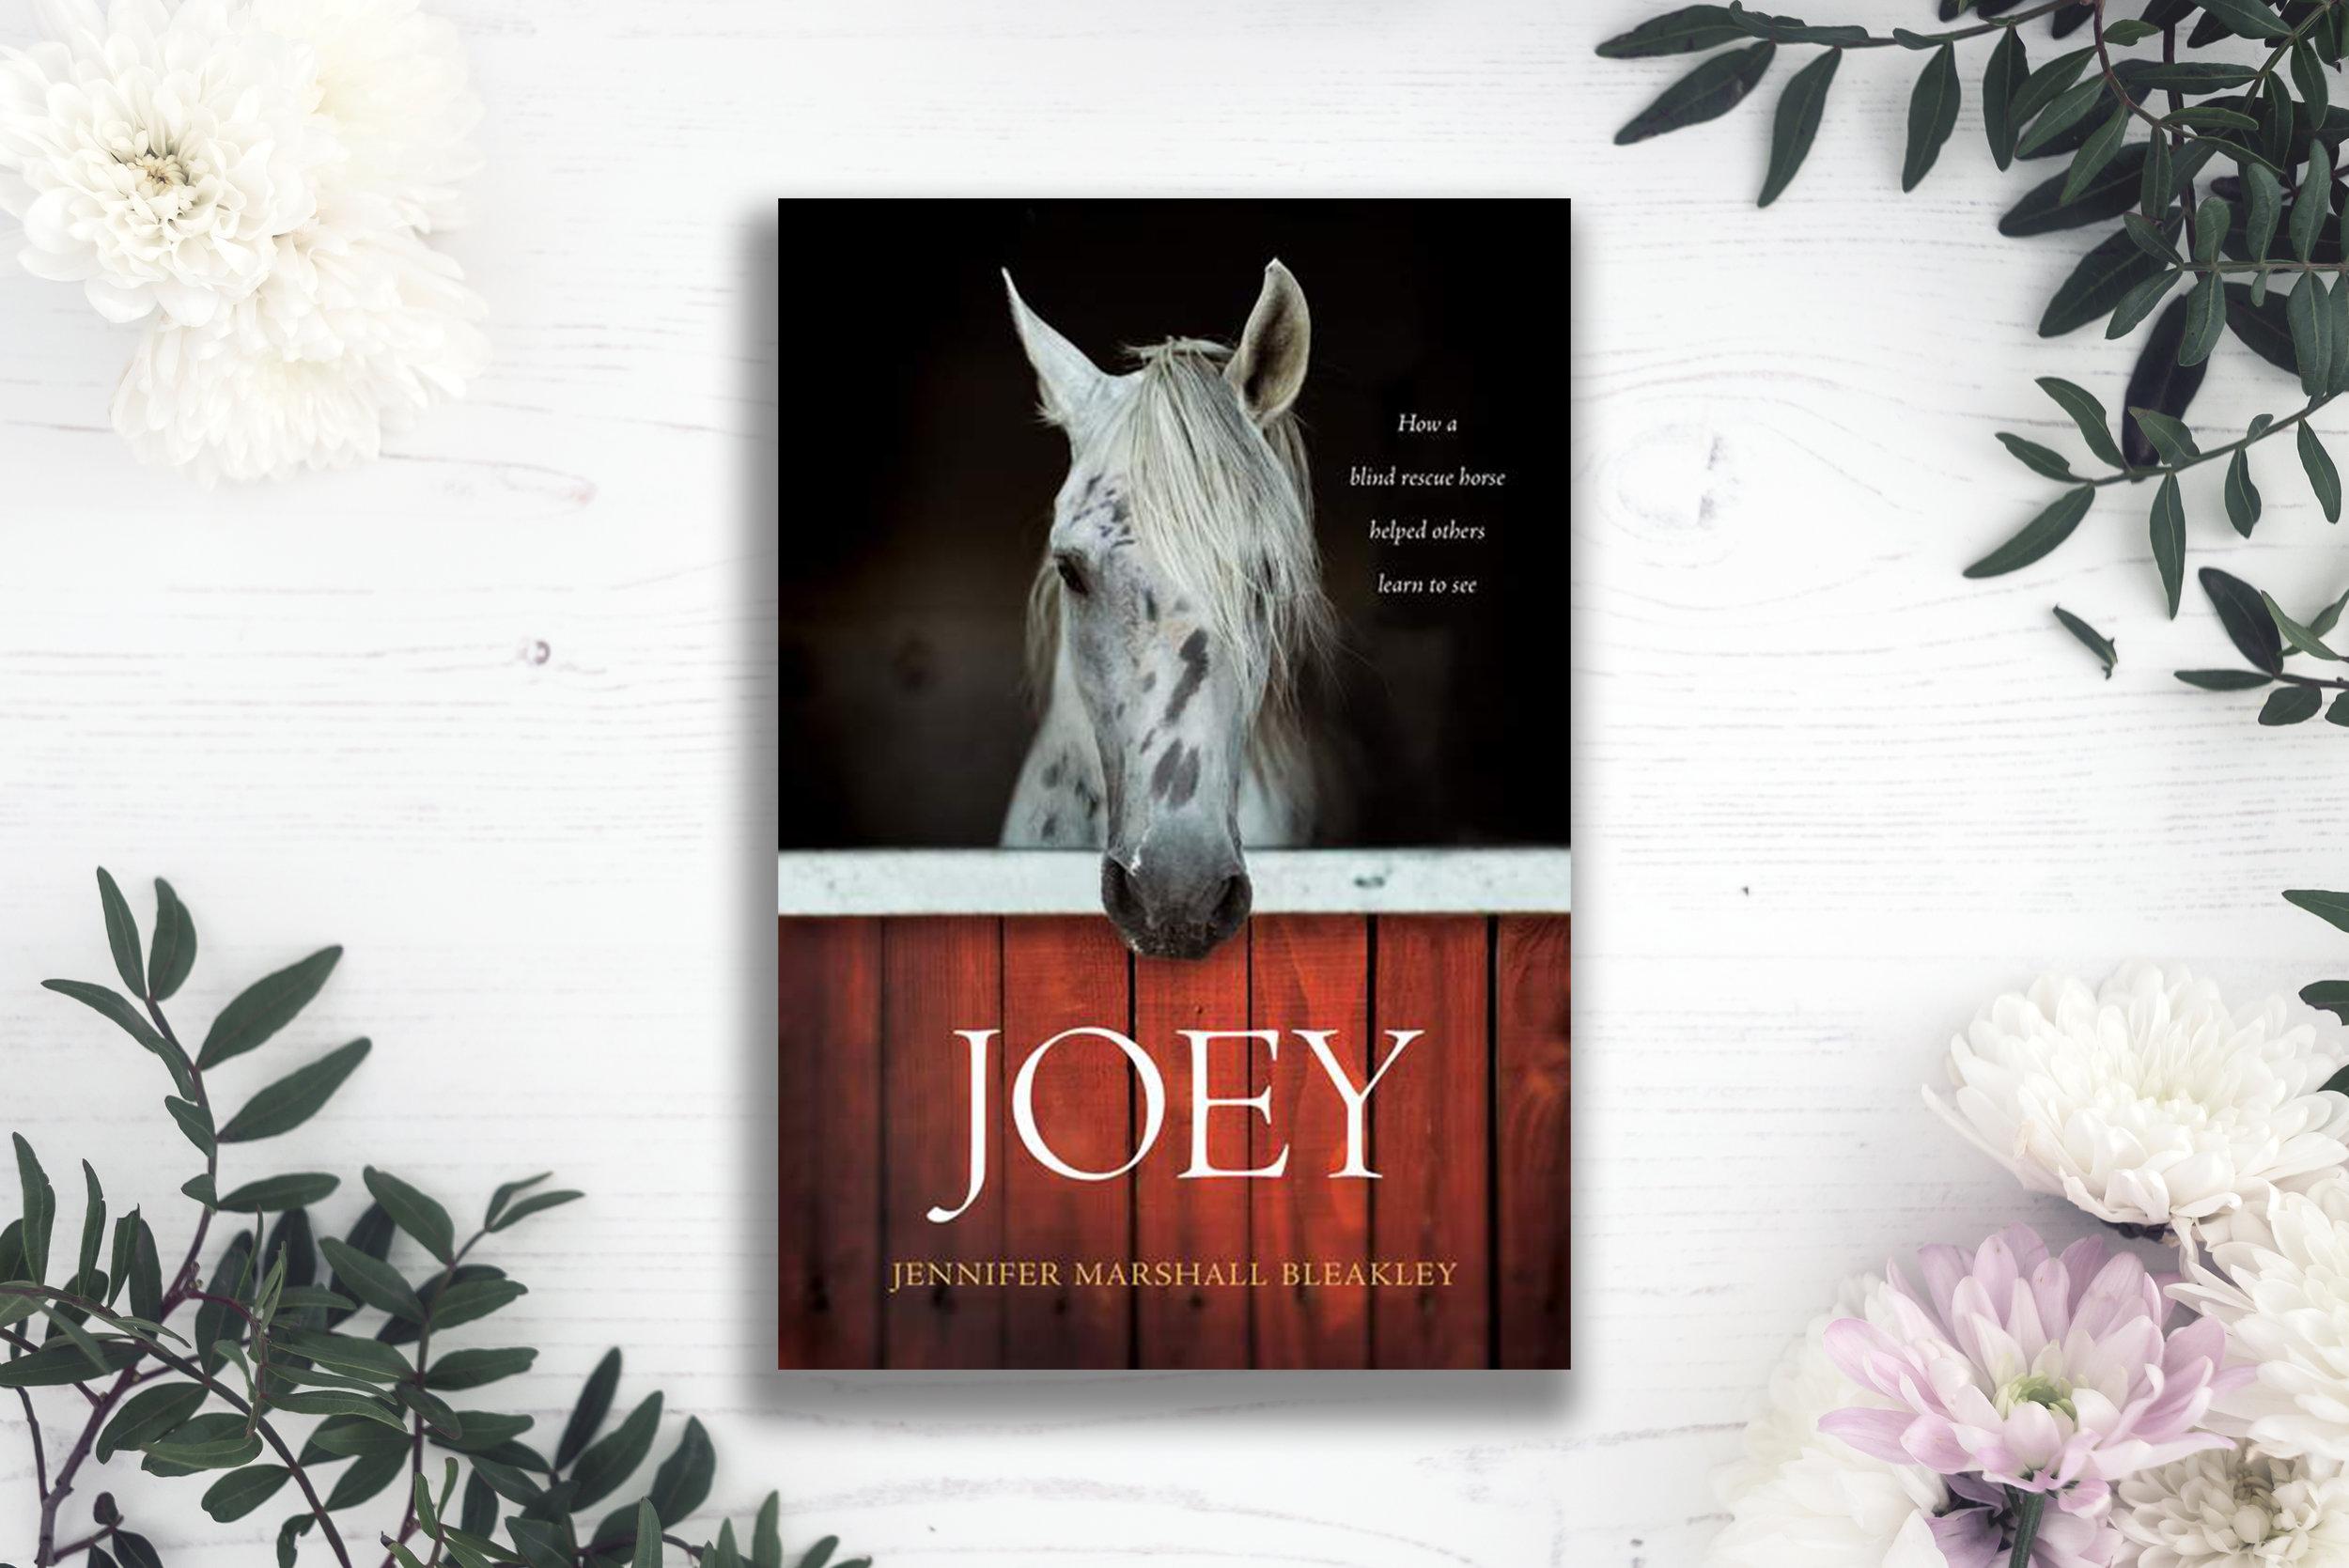 joey jennifer marshall bleakley book reivew